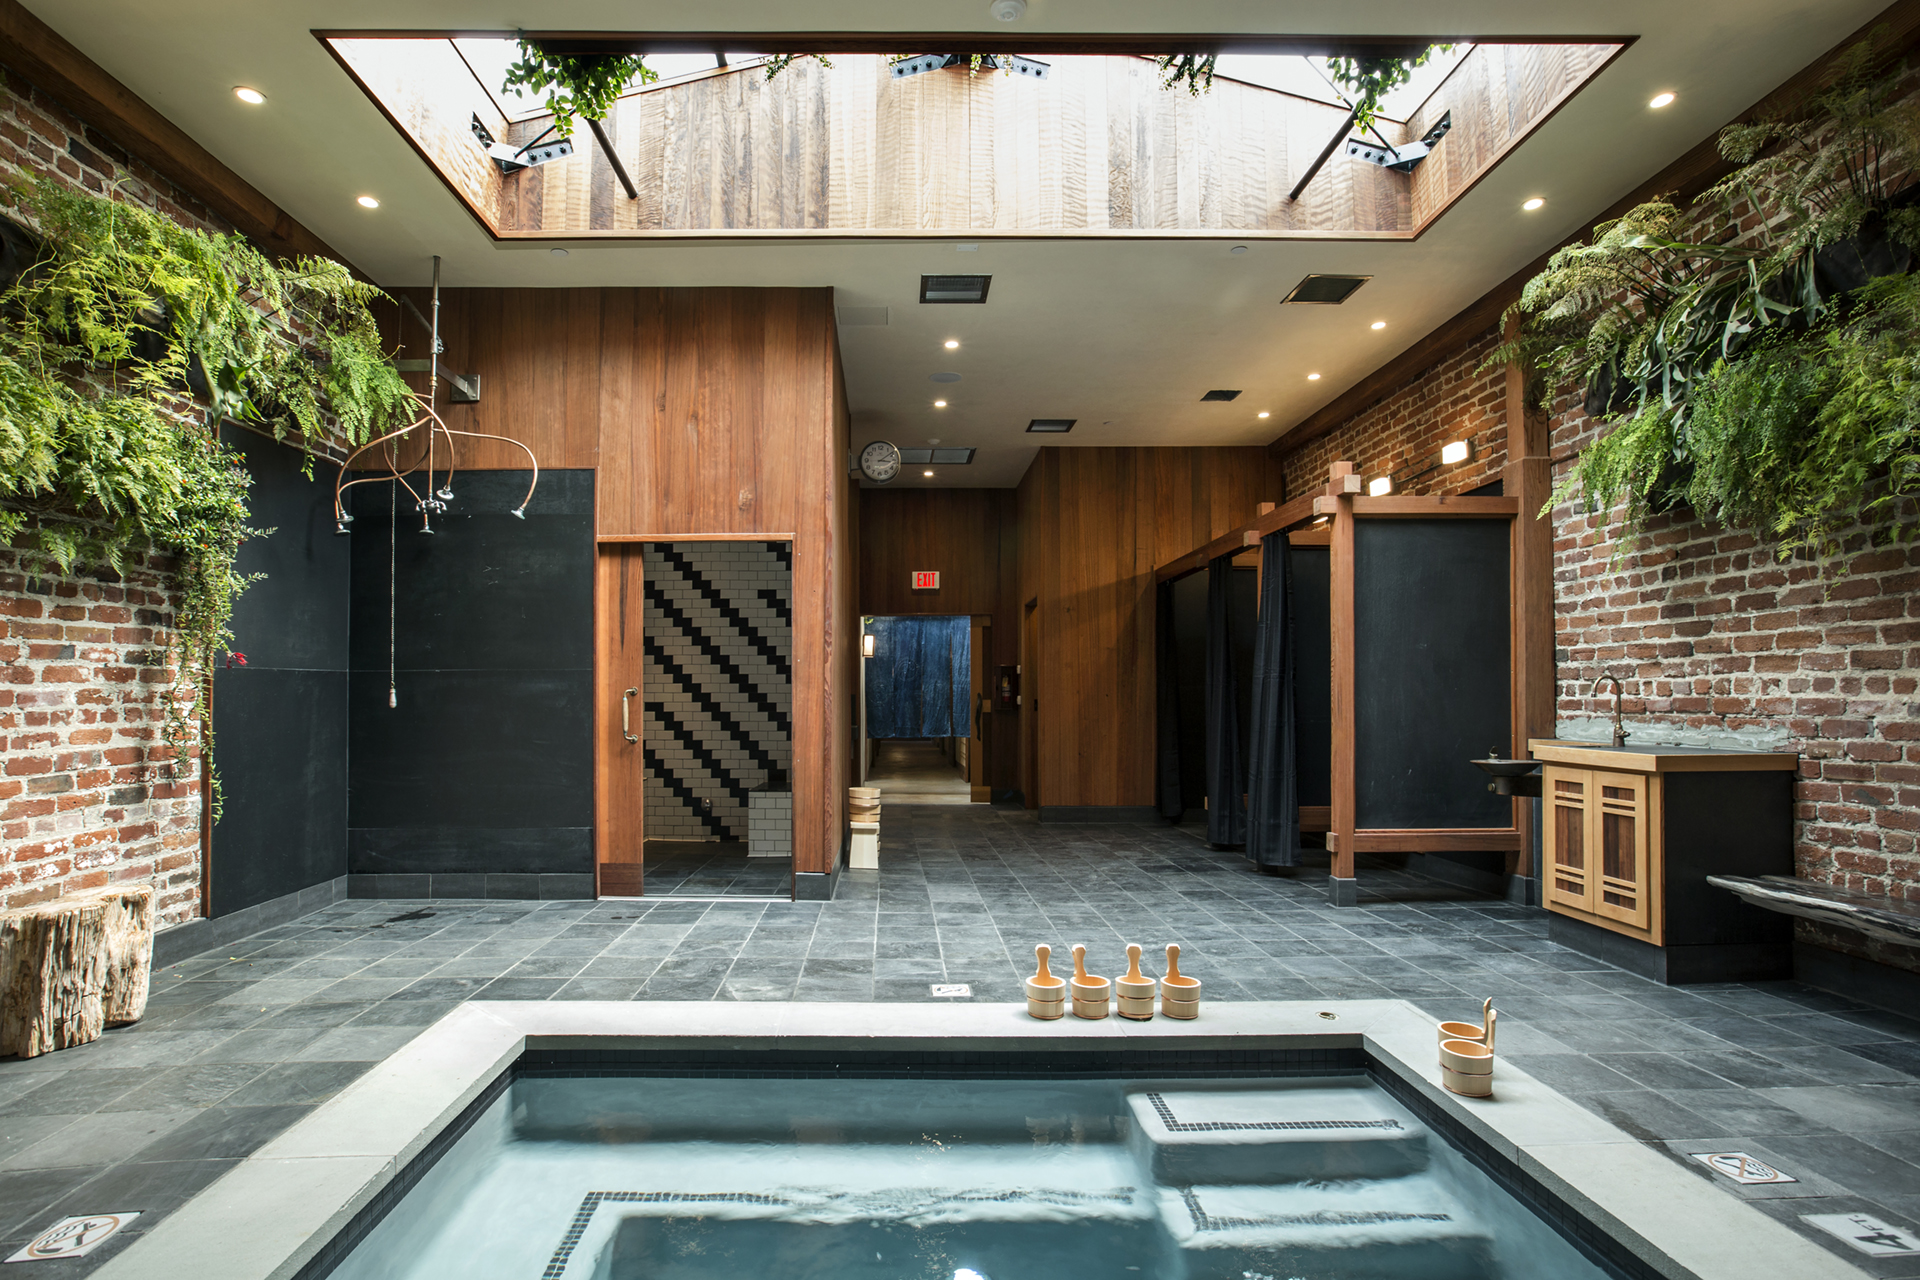 Onsen communal bathhouse